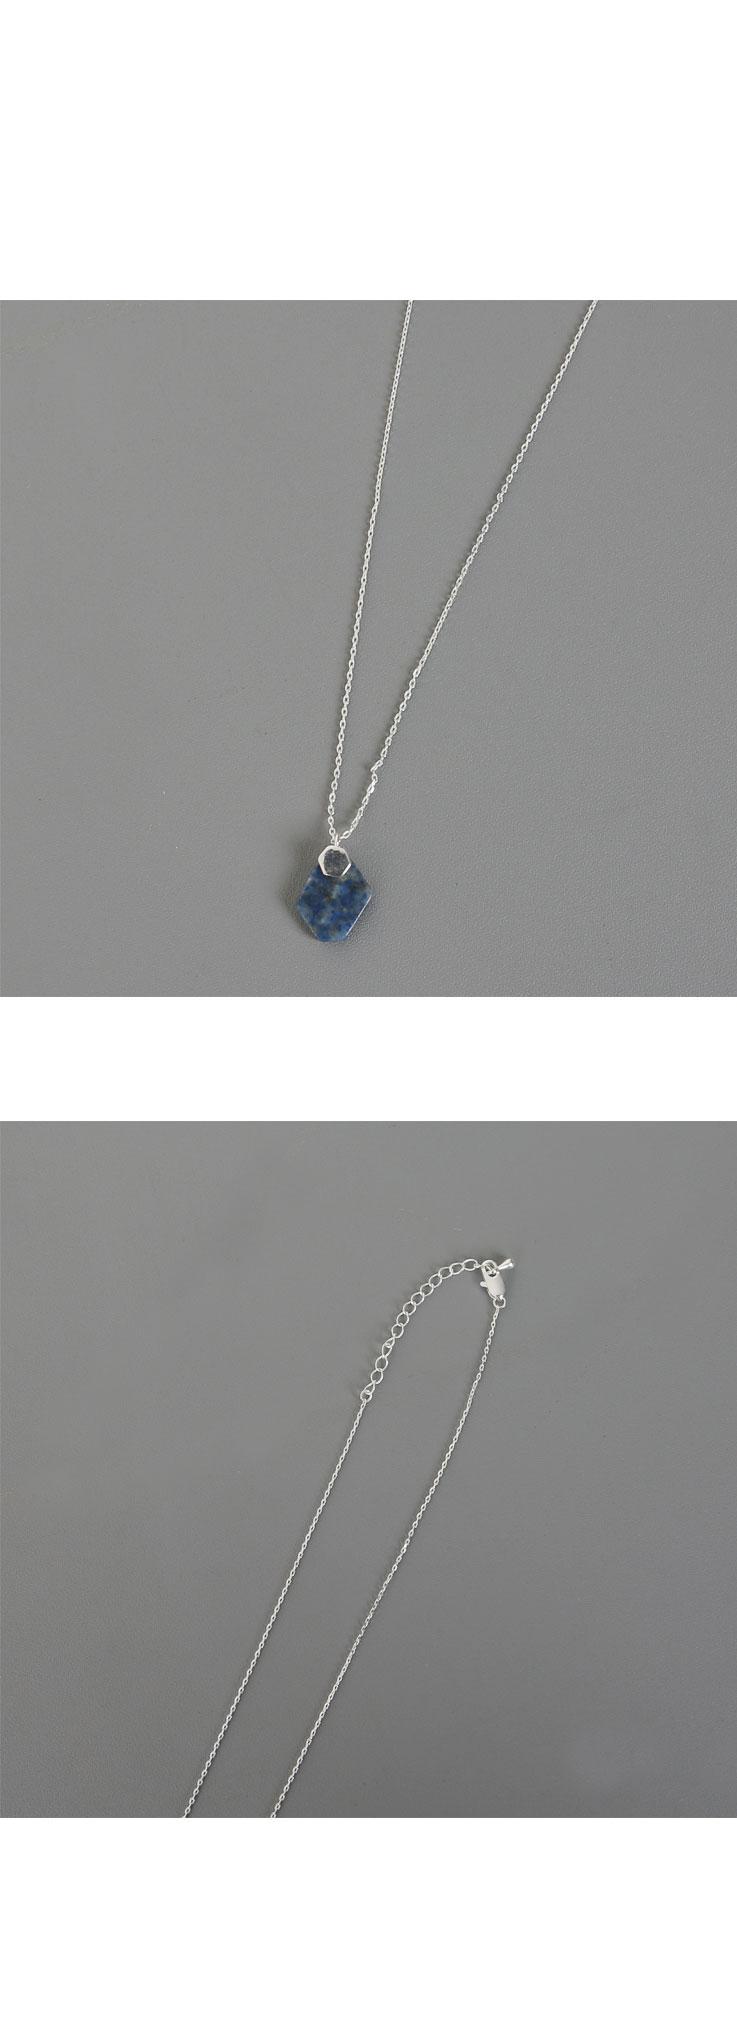 Zem No.140 (necklace)